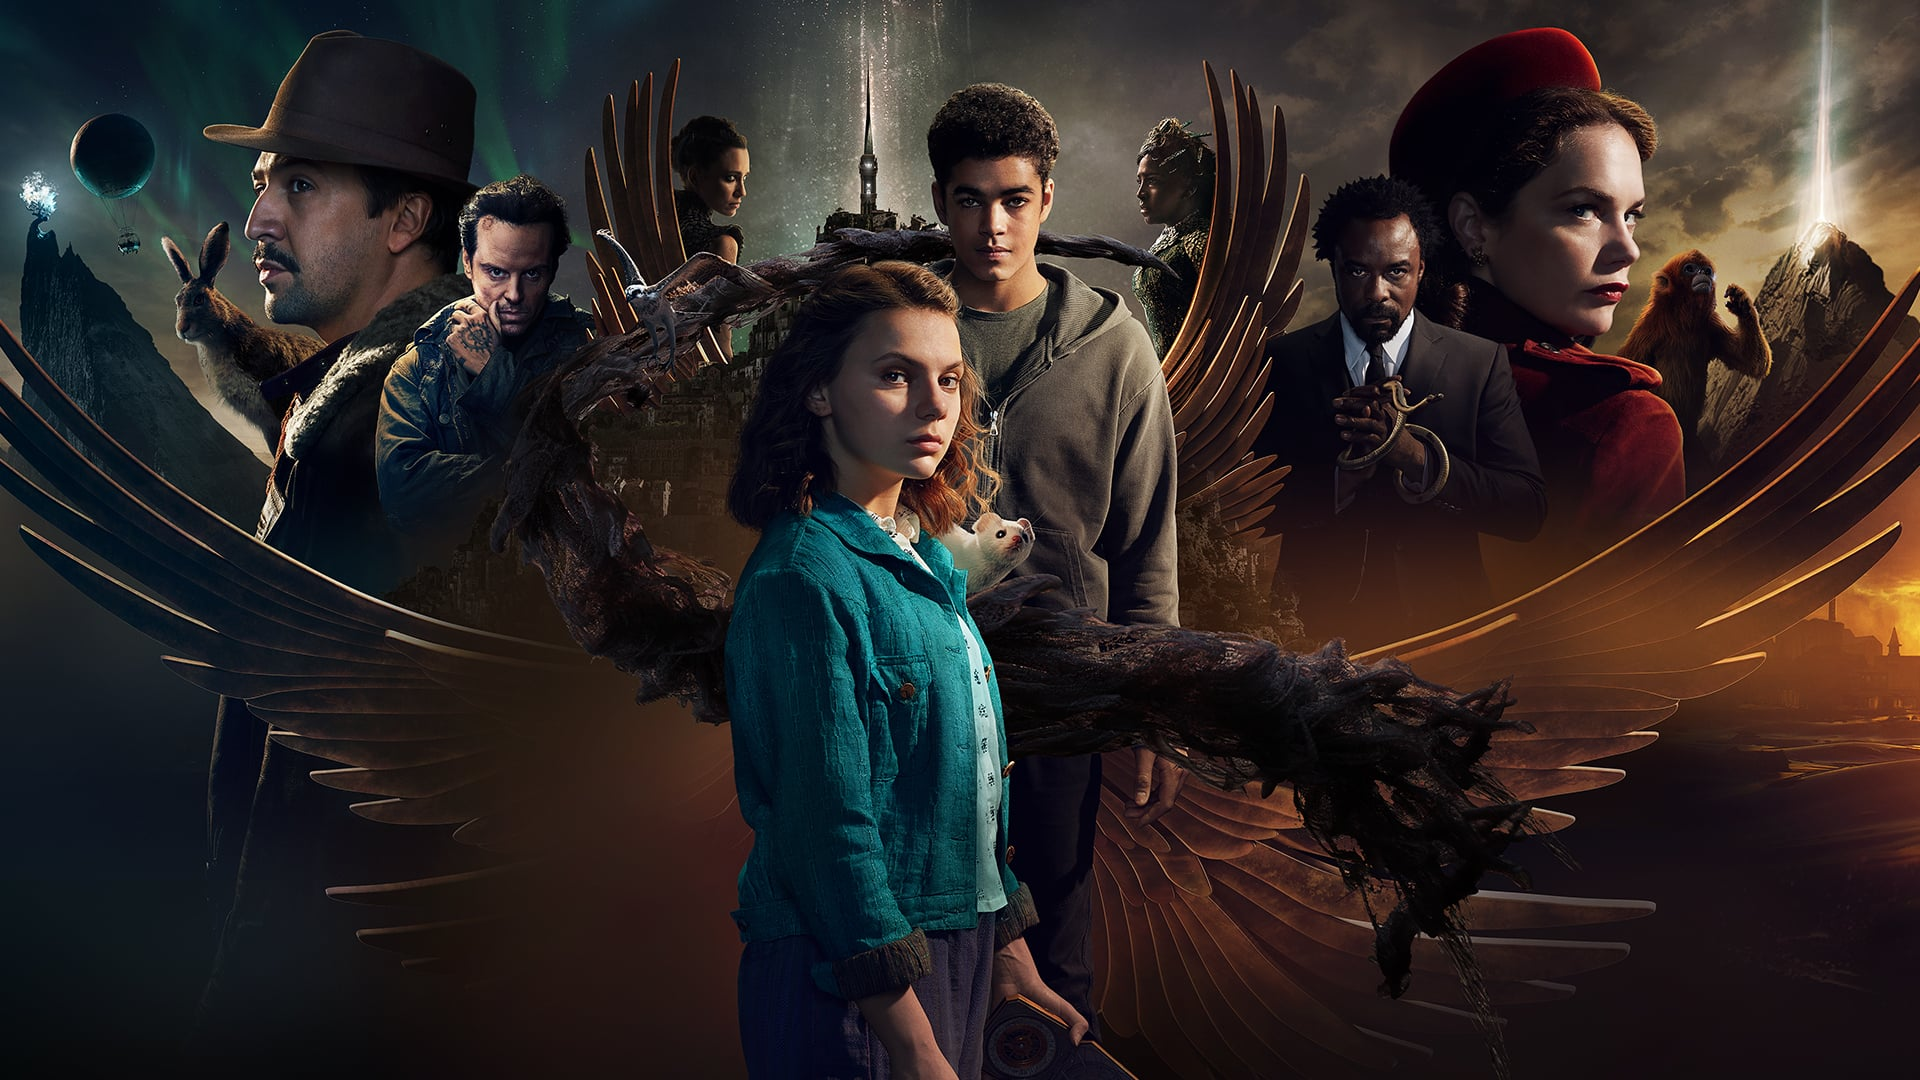 Parada Temporal: His Dark Materials 2x01 – The City of Magpies